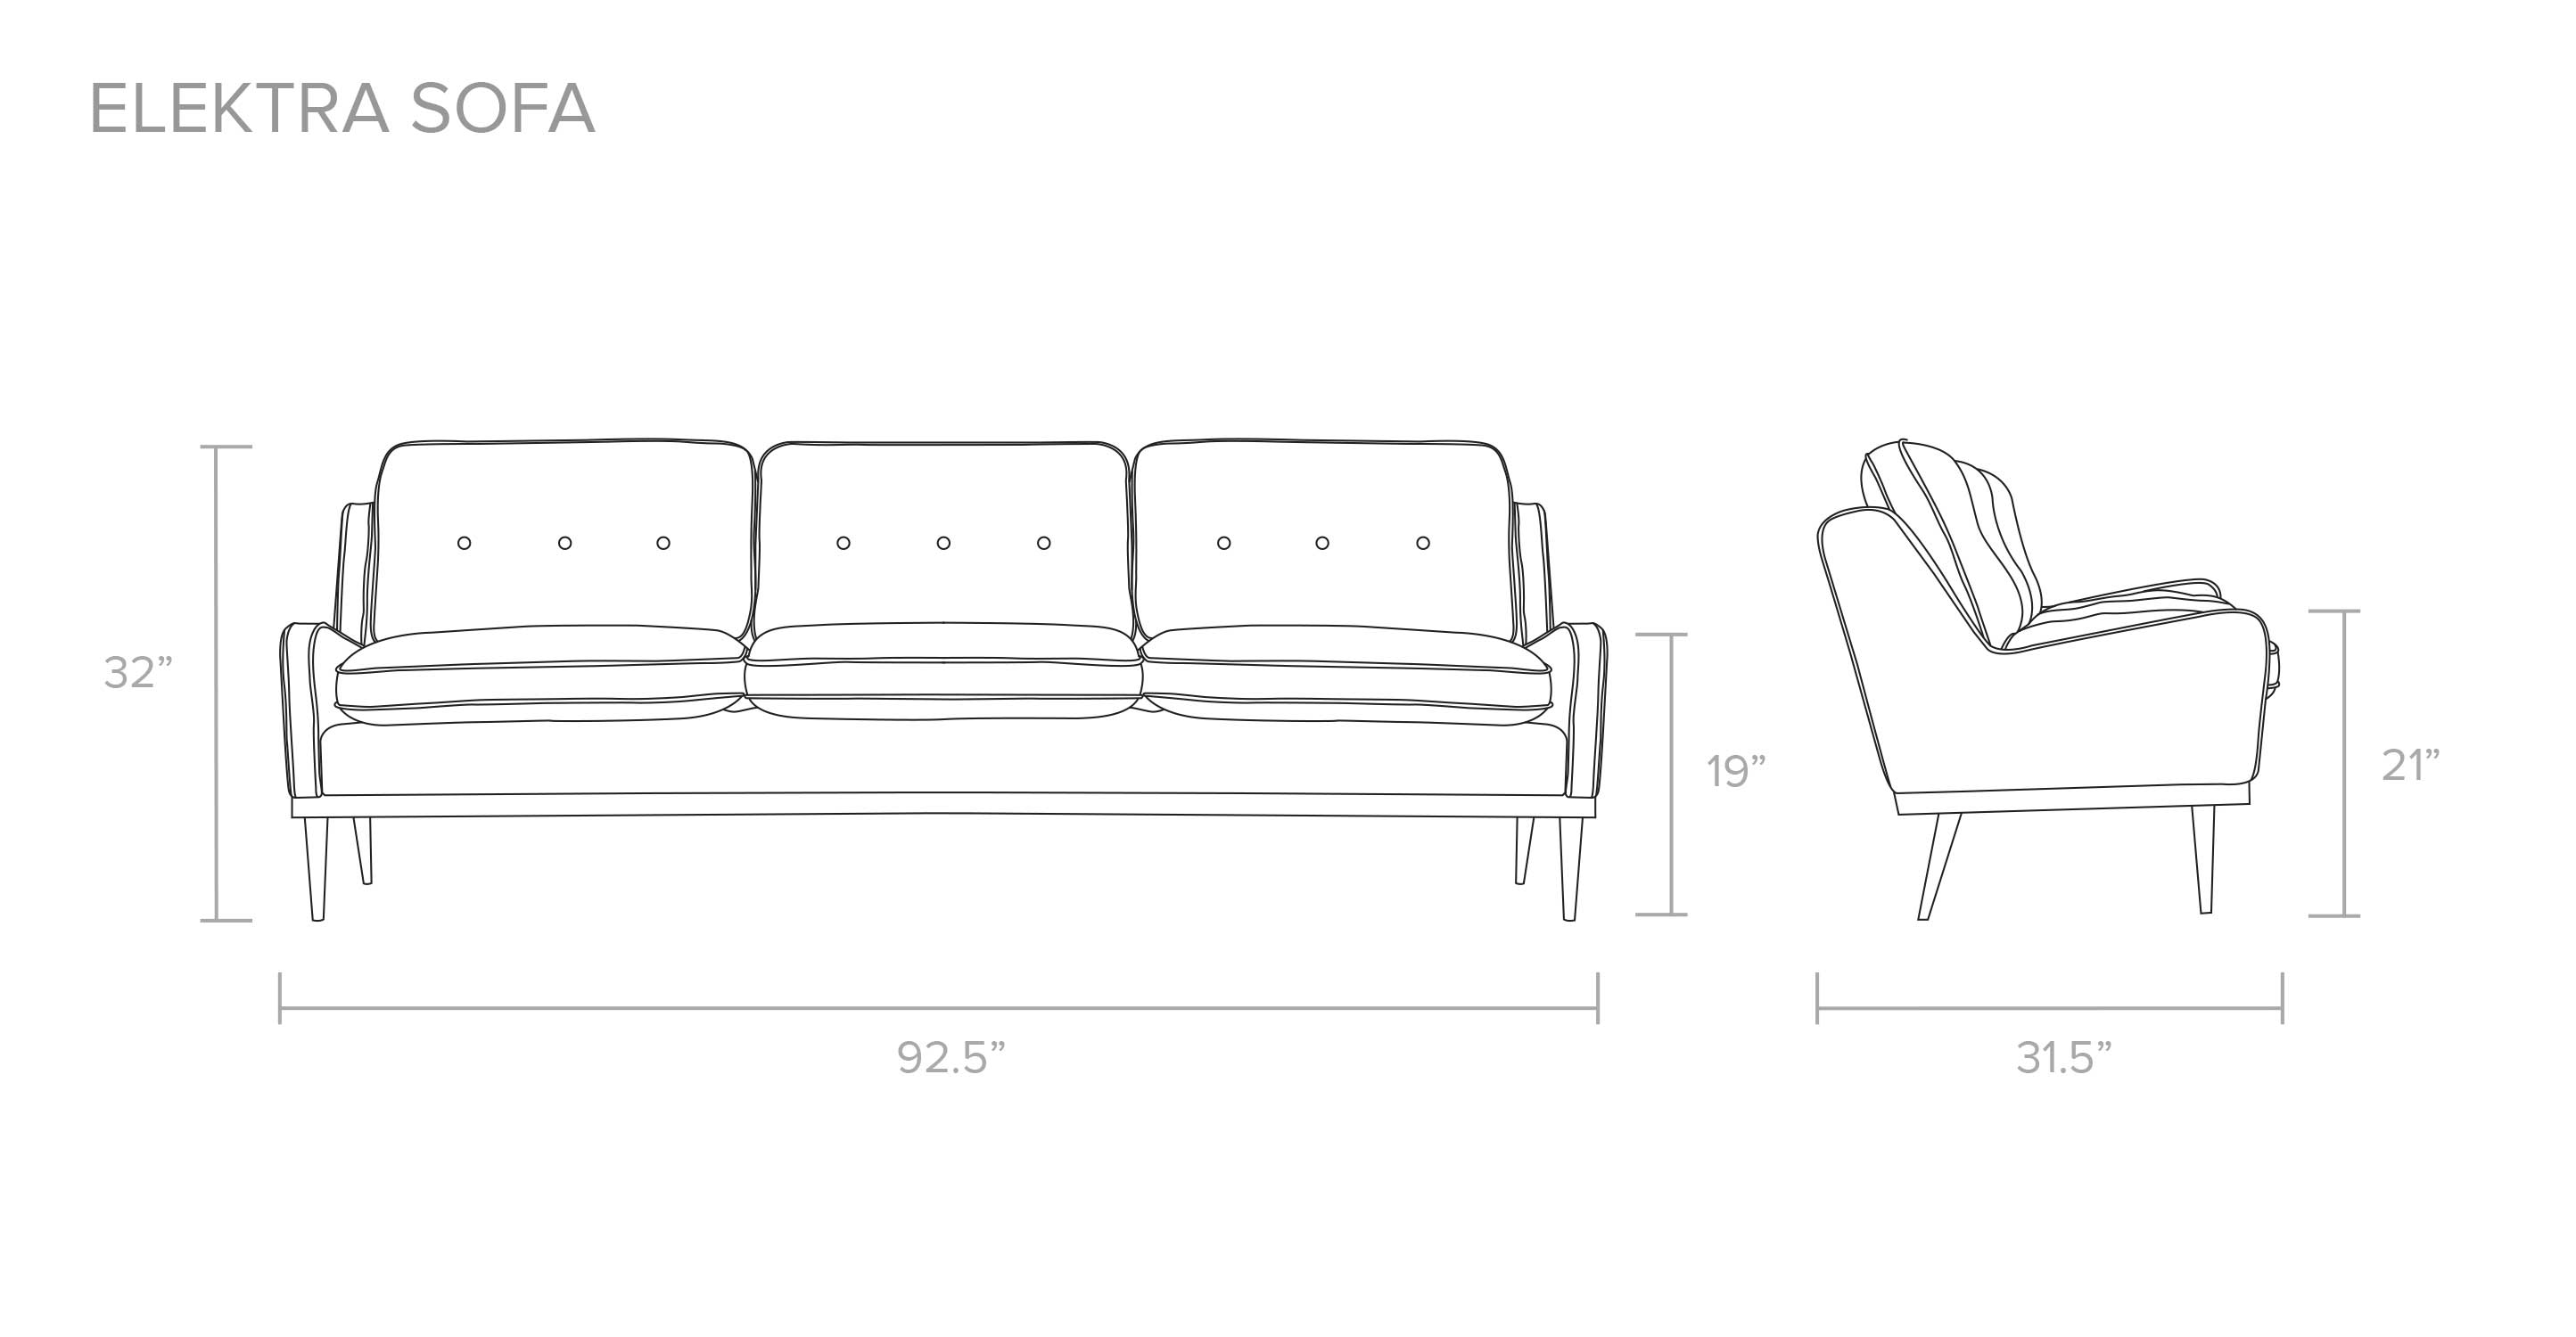 drawings-elektra3.jpg